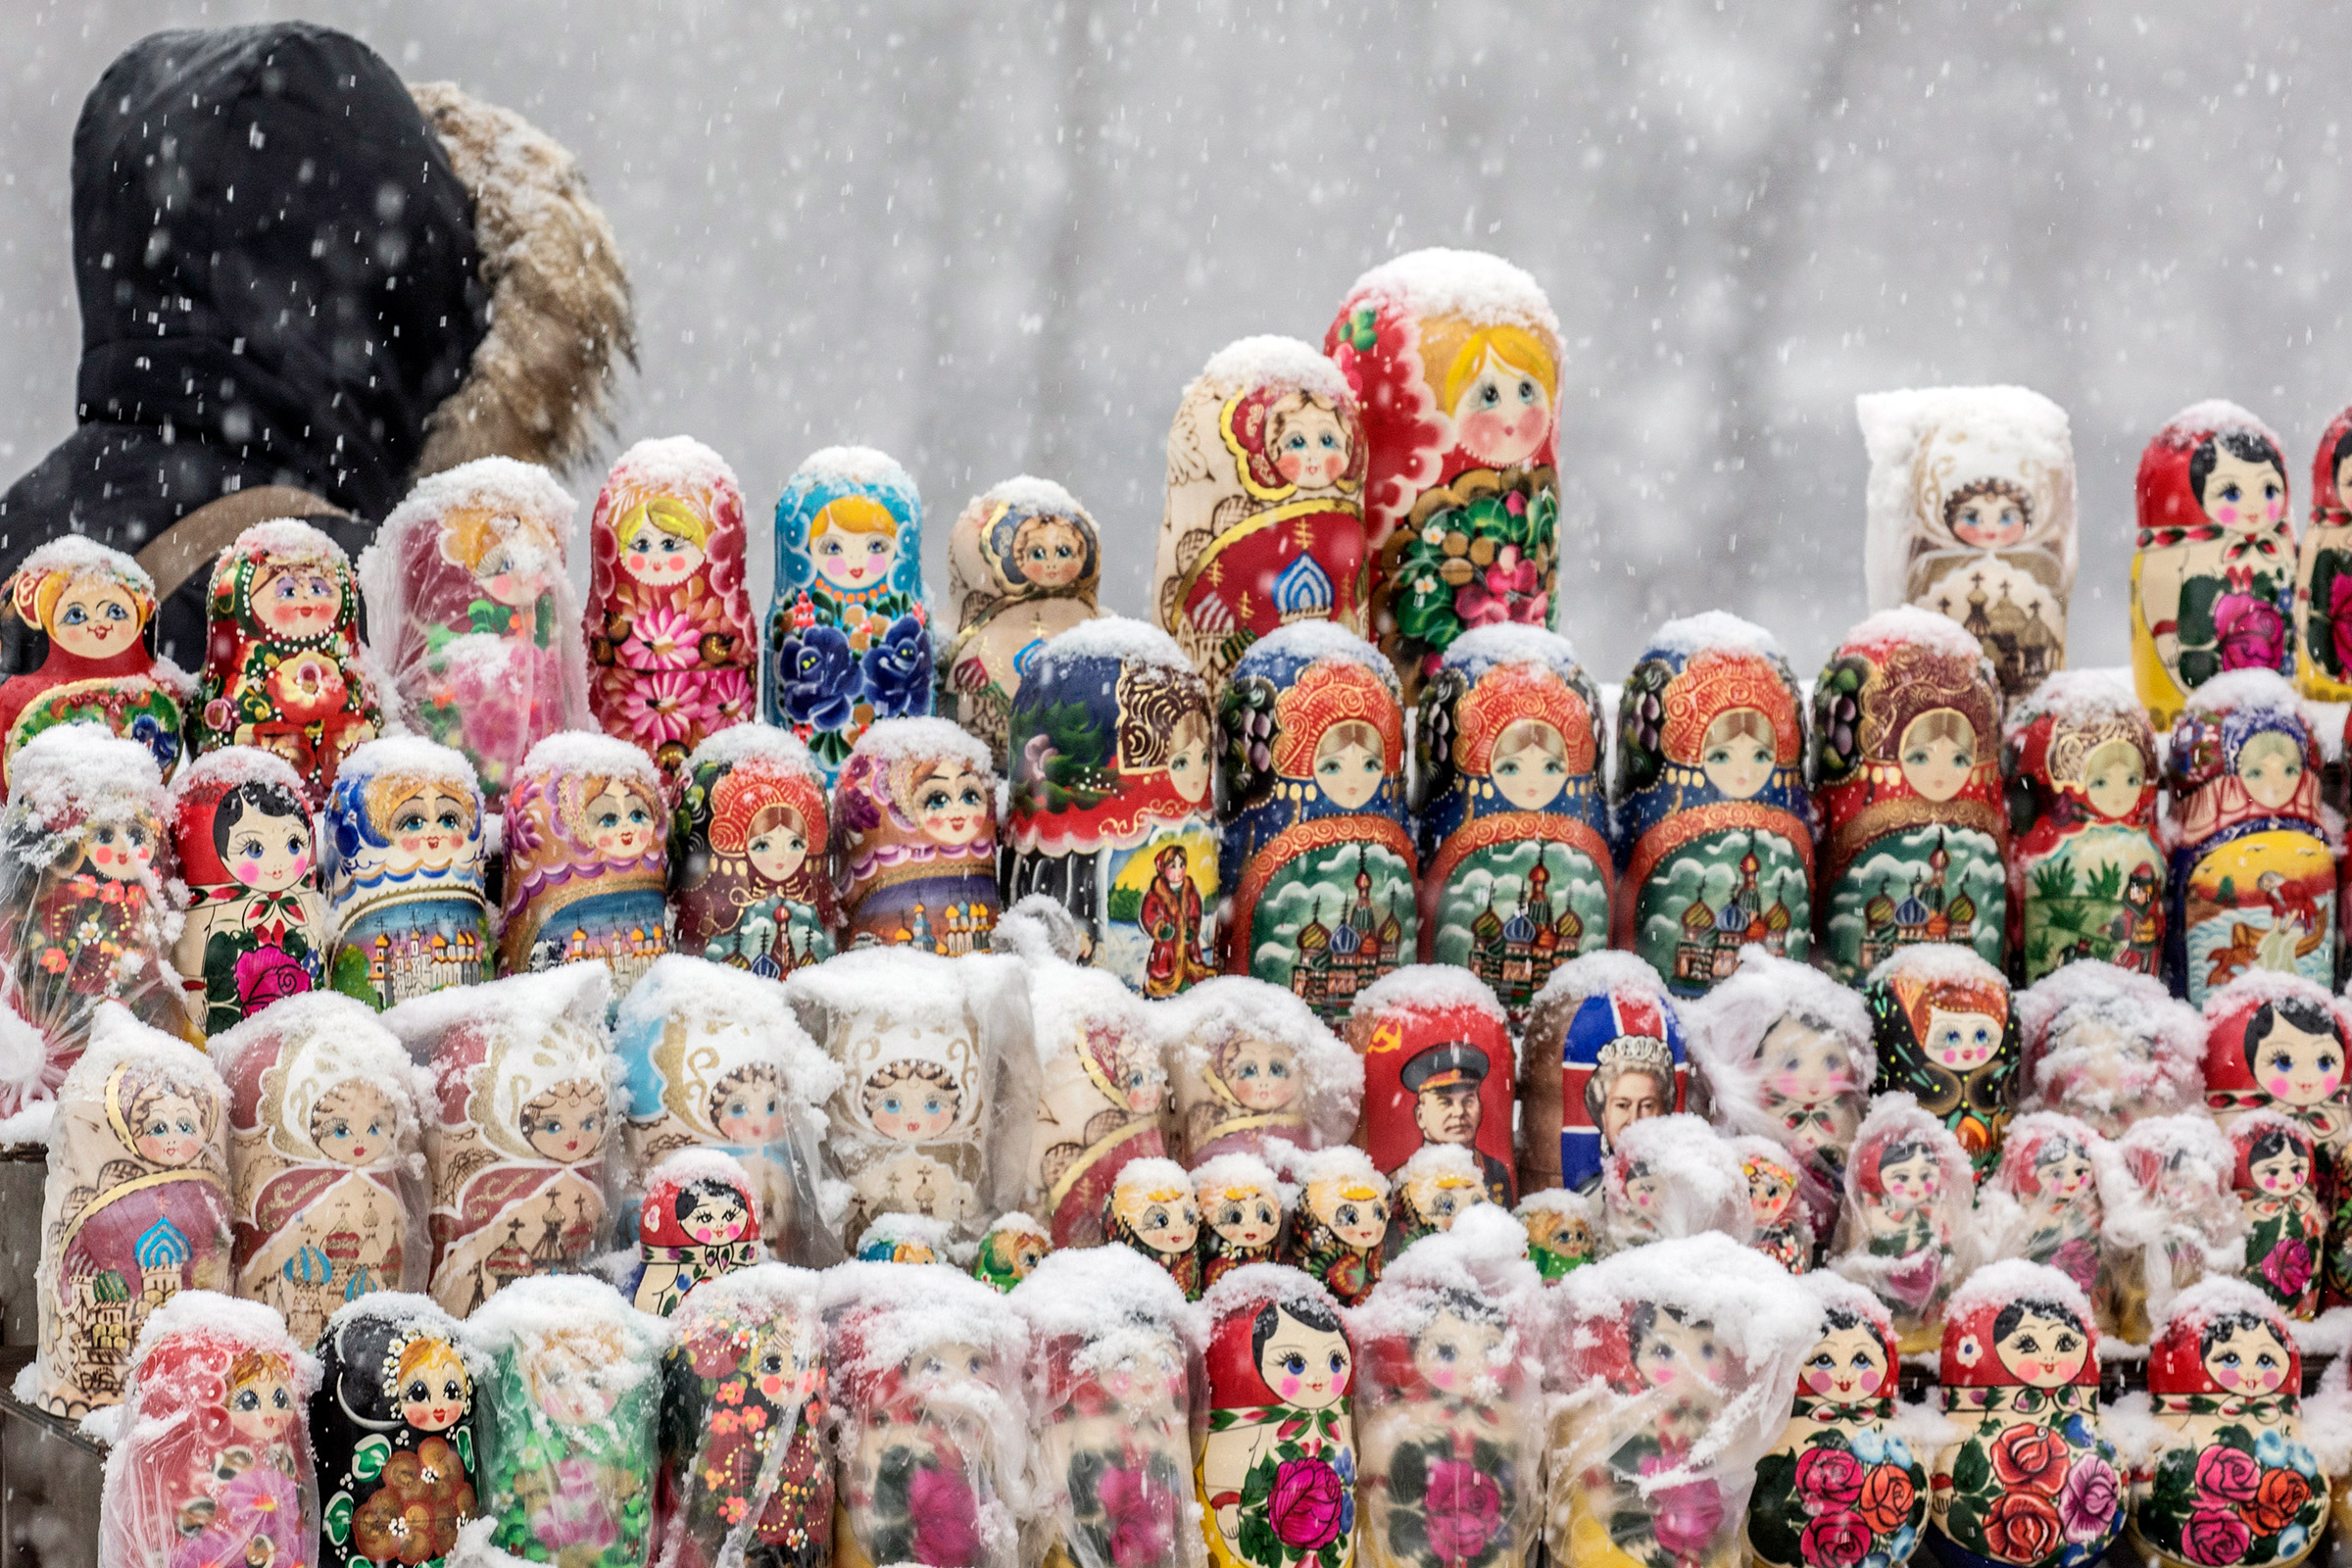 Фото:Михаил Джапаридзе / ТАСС